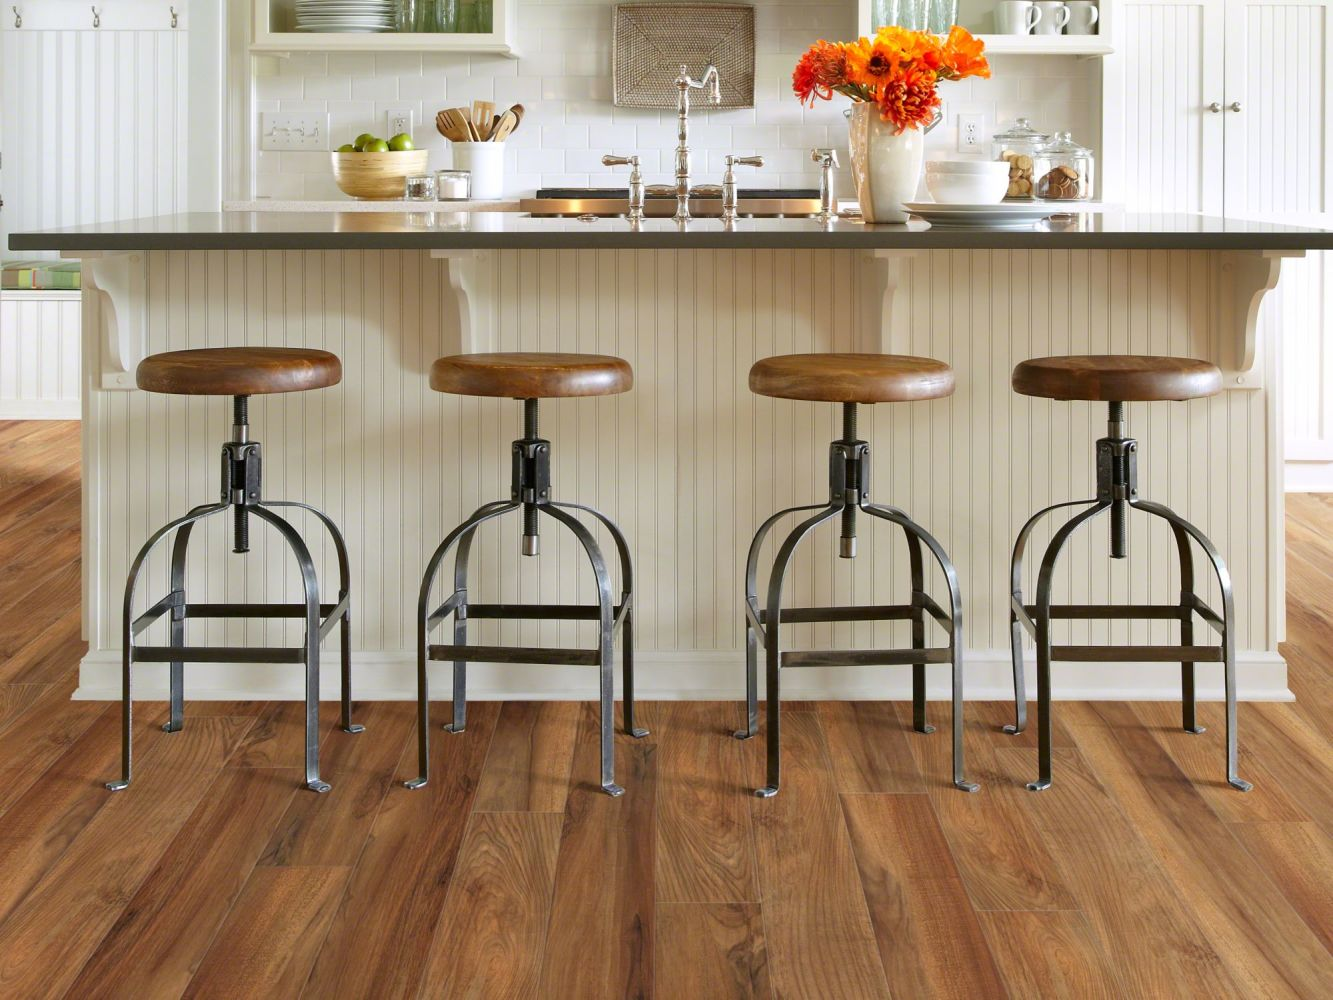 Shaw Floors Resilient Residential Legacy Plus Venna 00820_0458V